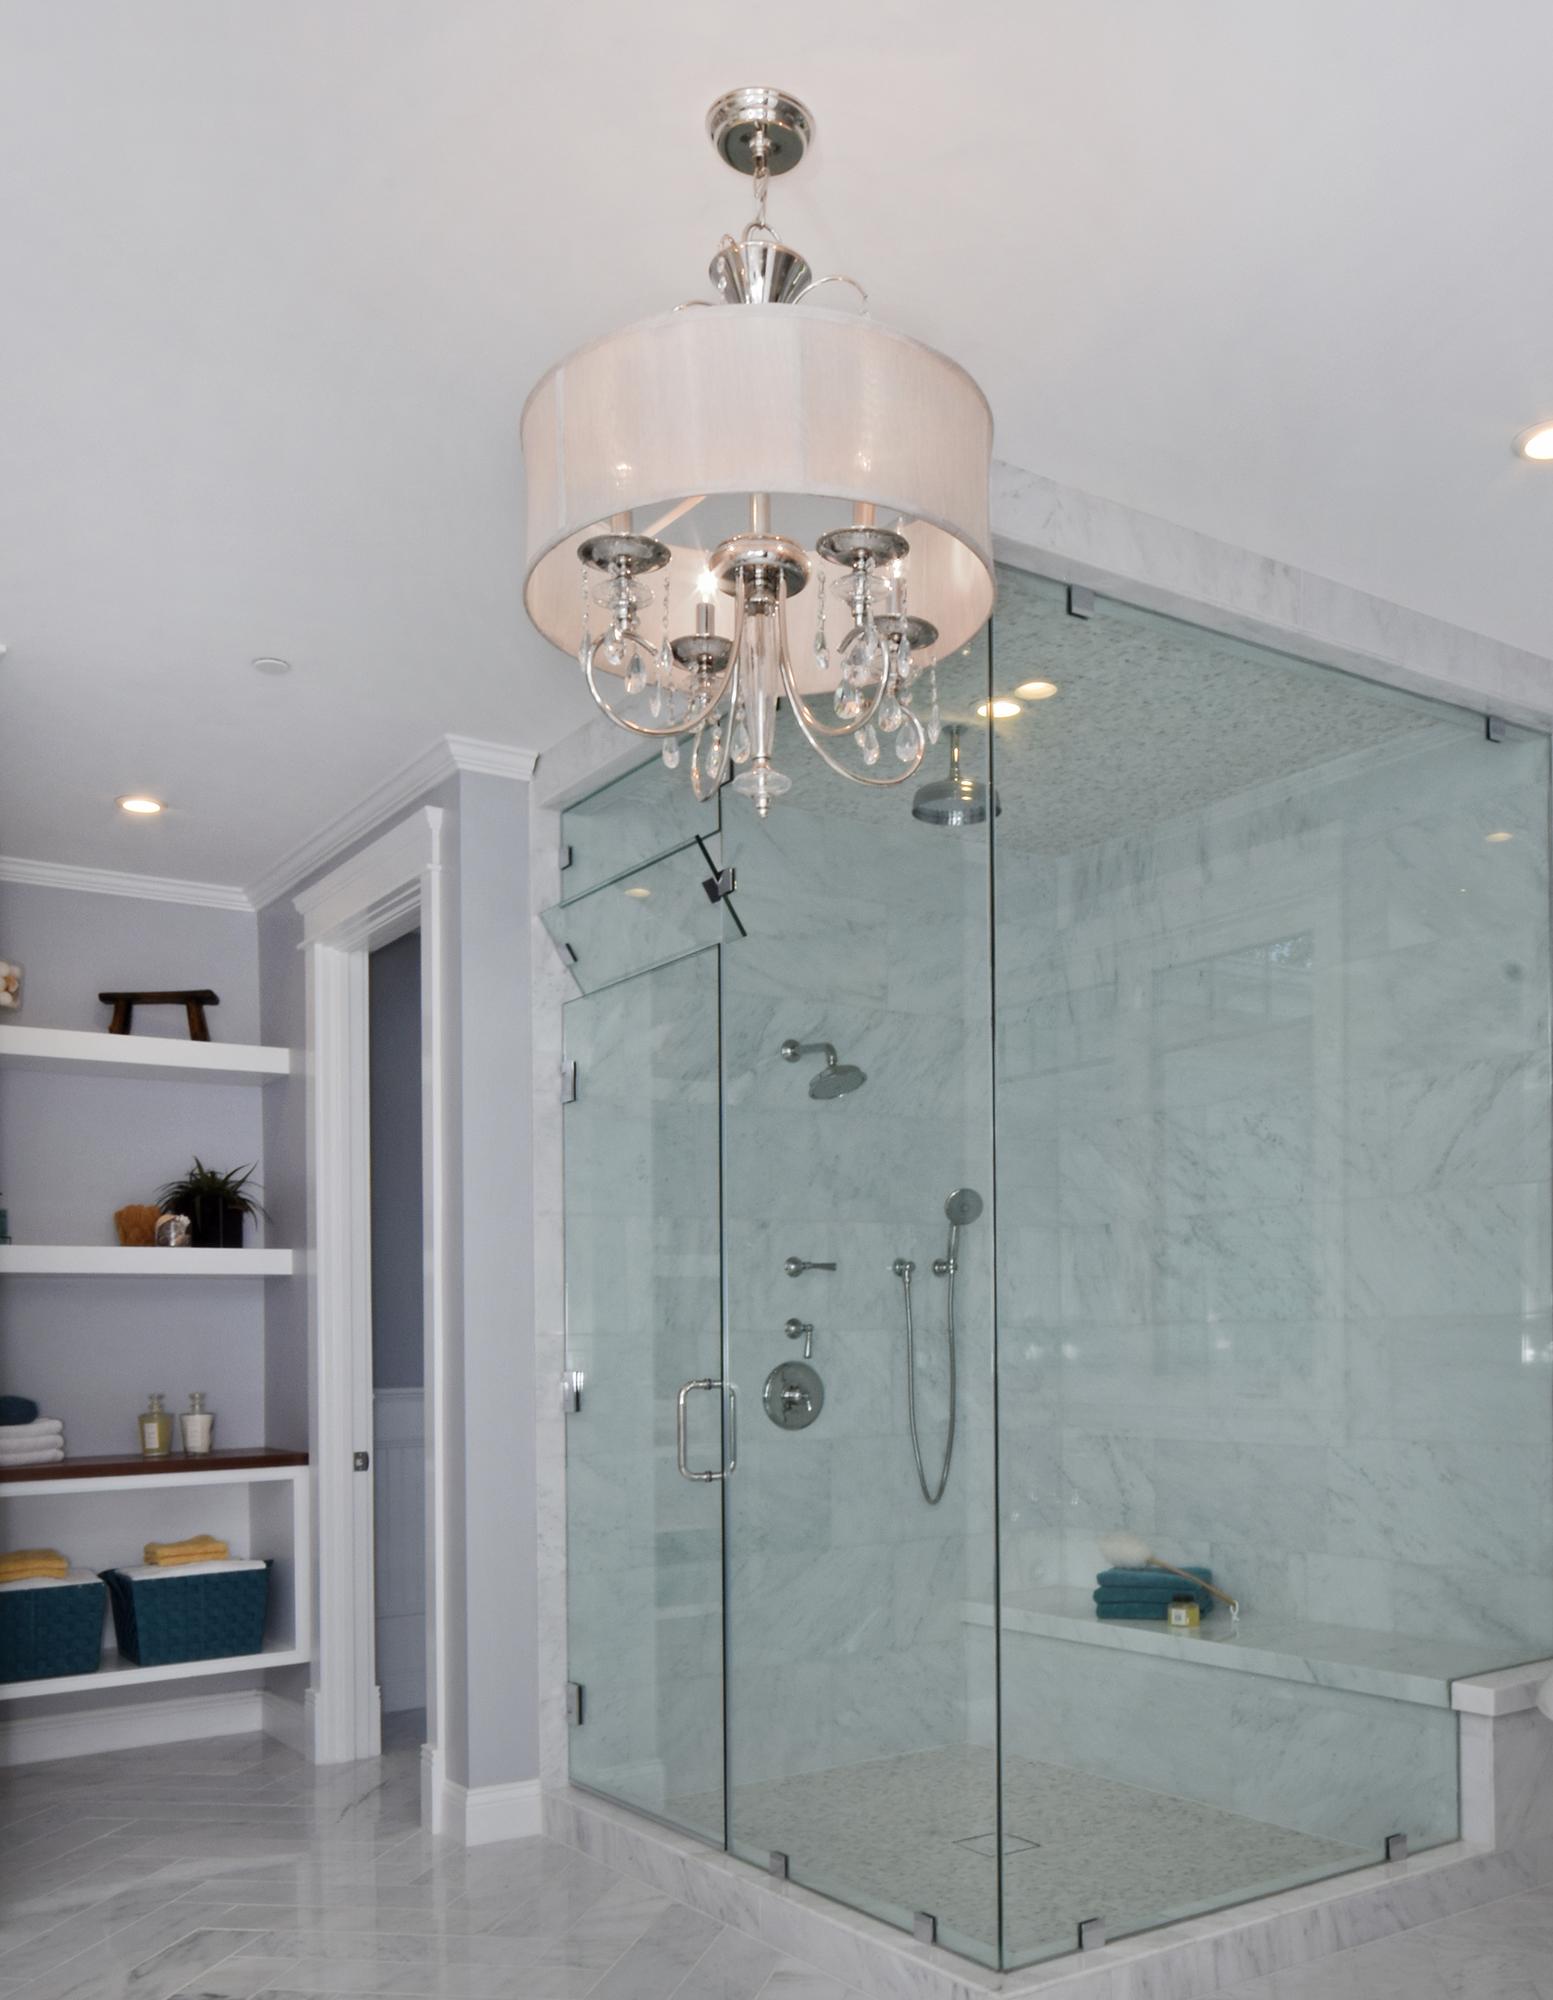 Installation Gallery | Bathroom Lighting | Chandeliers & Pendants